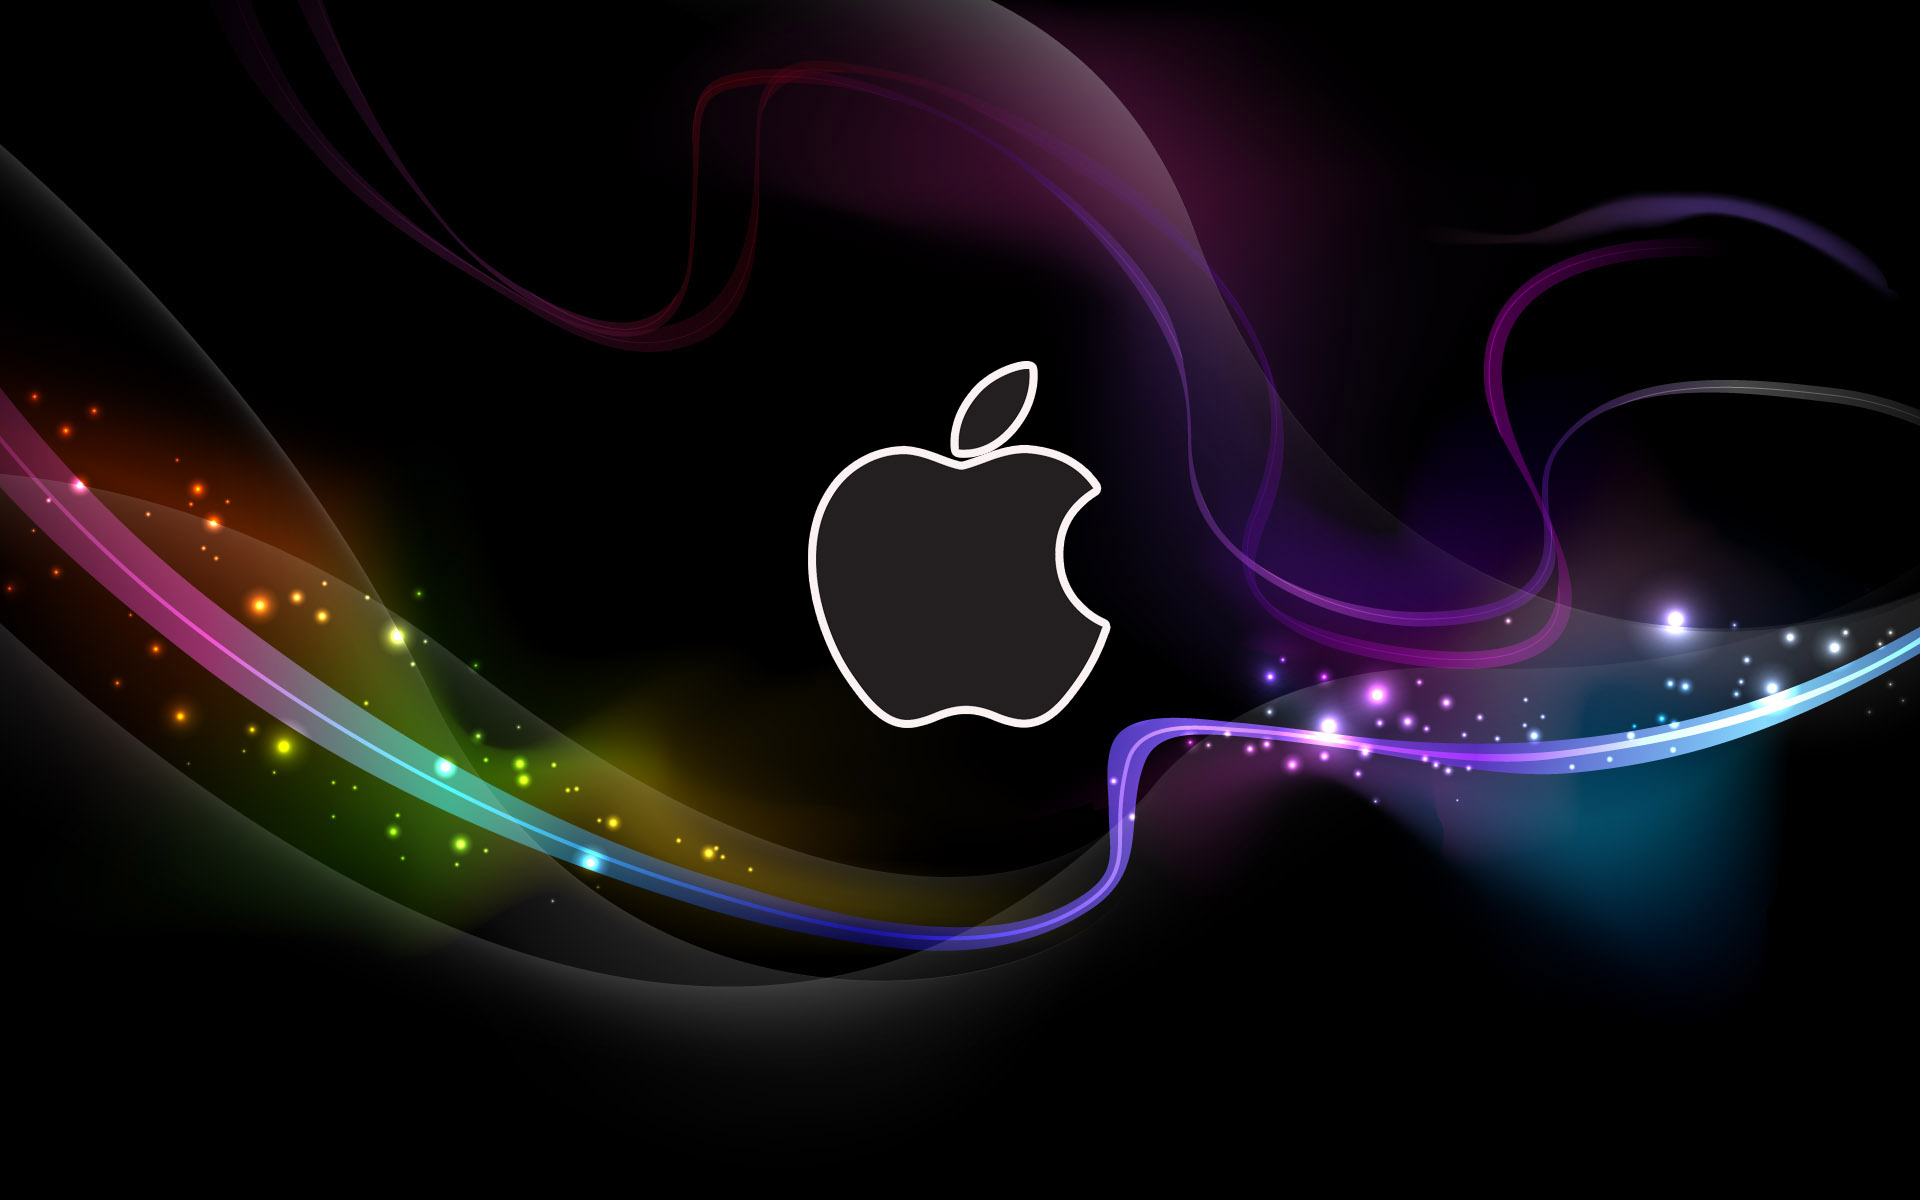 Apple Wallpaper Download Laptop 13675 Wallpaper Cool 1920x1200